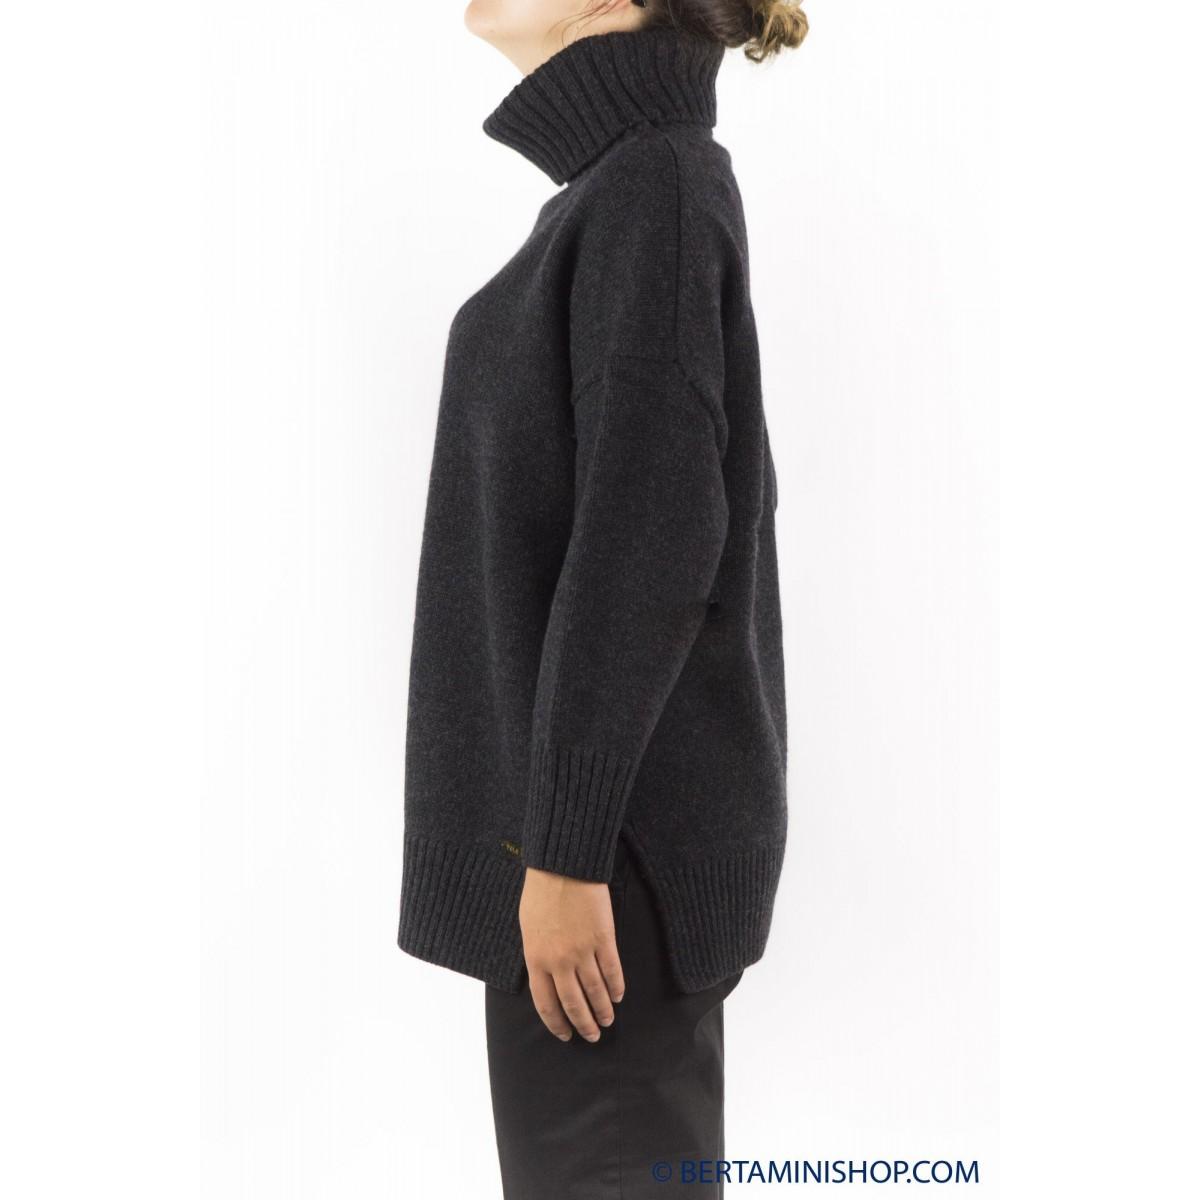 Jumper Ralph Lauren Woman - V39Id318Wd236 BBD15 - Antracite